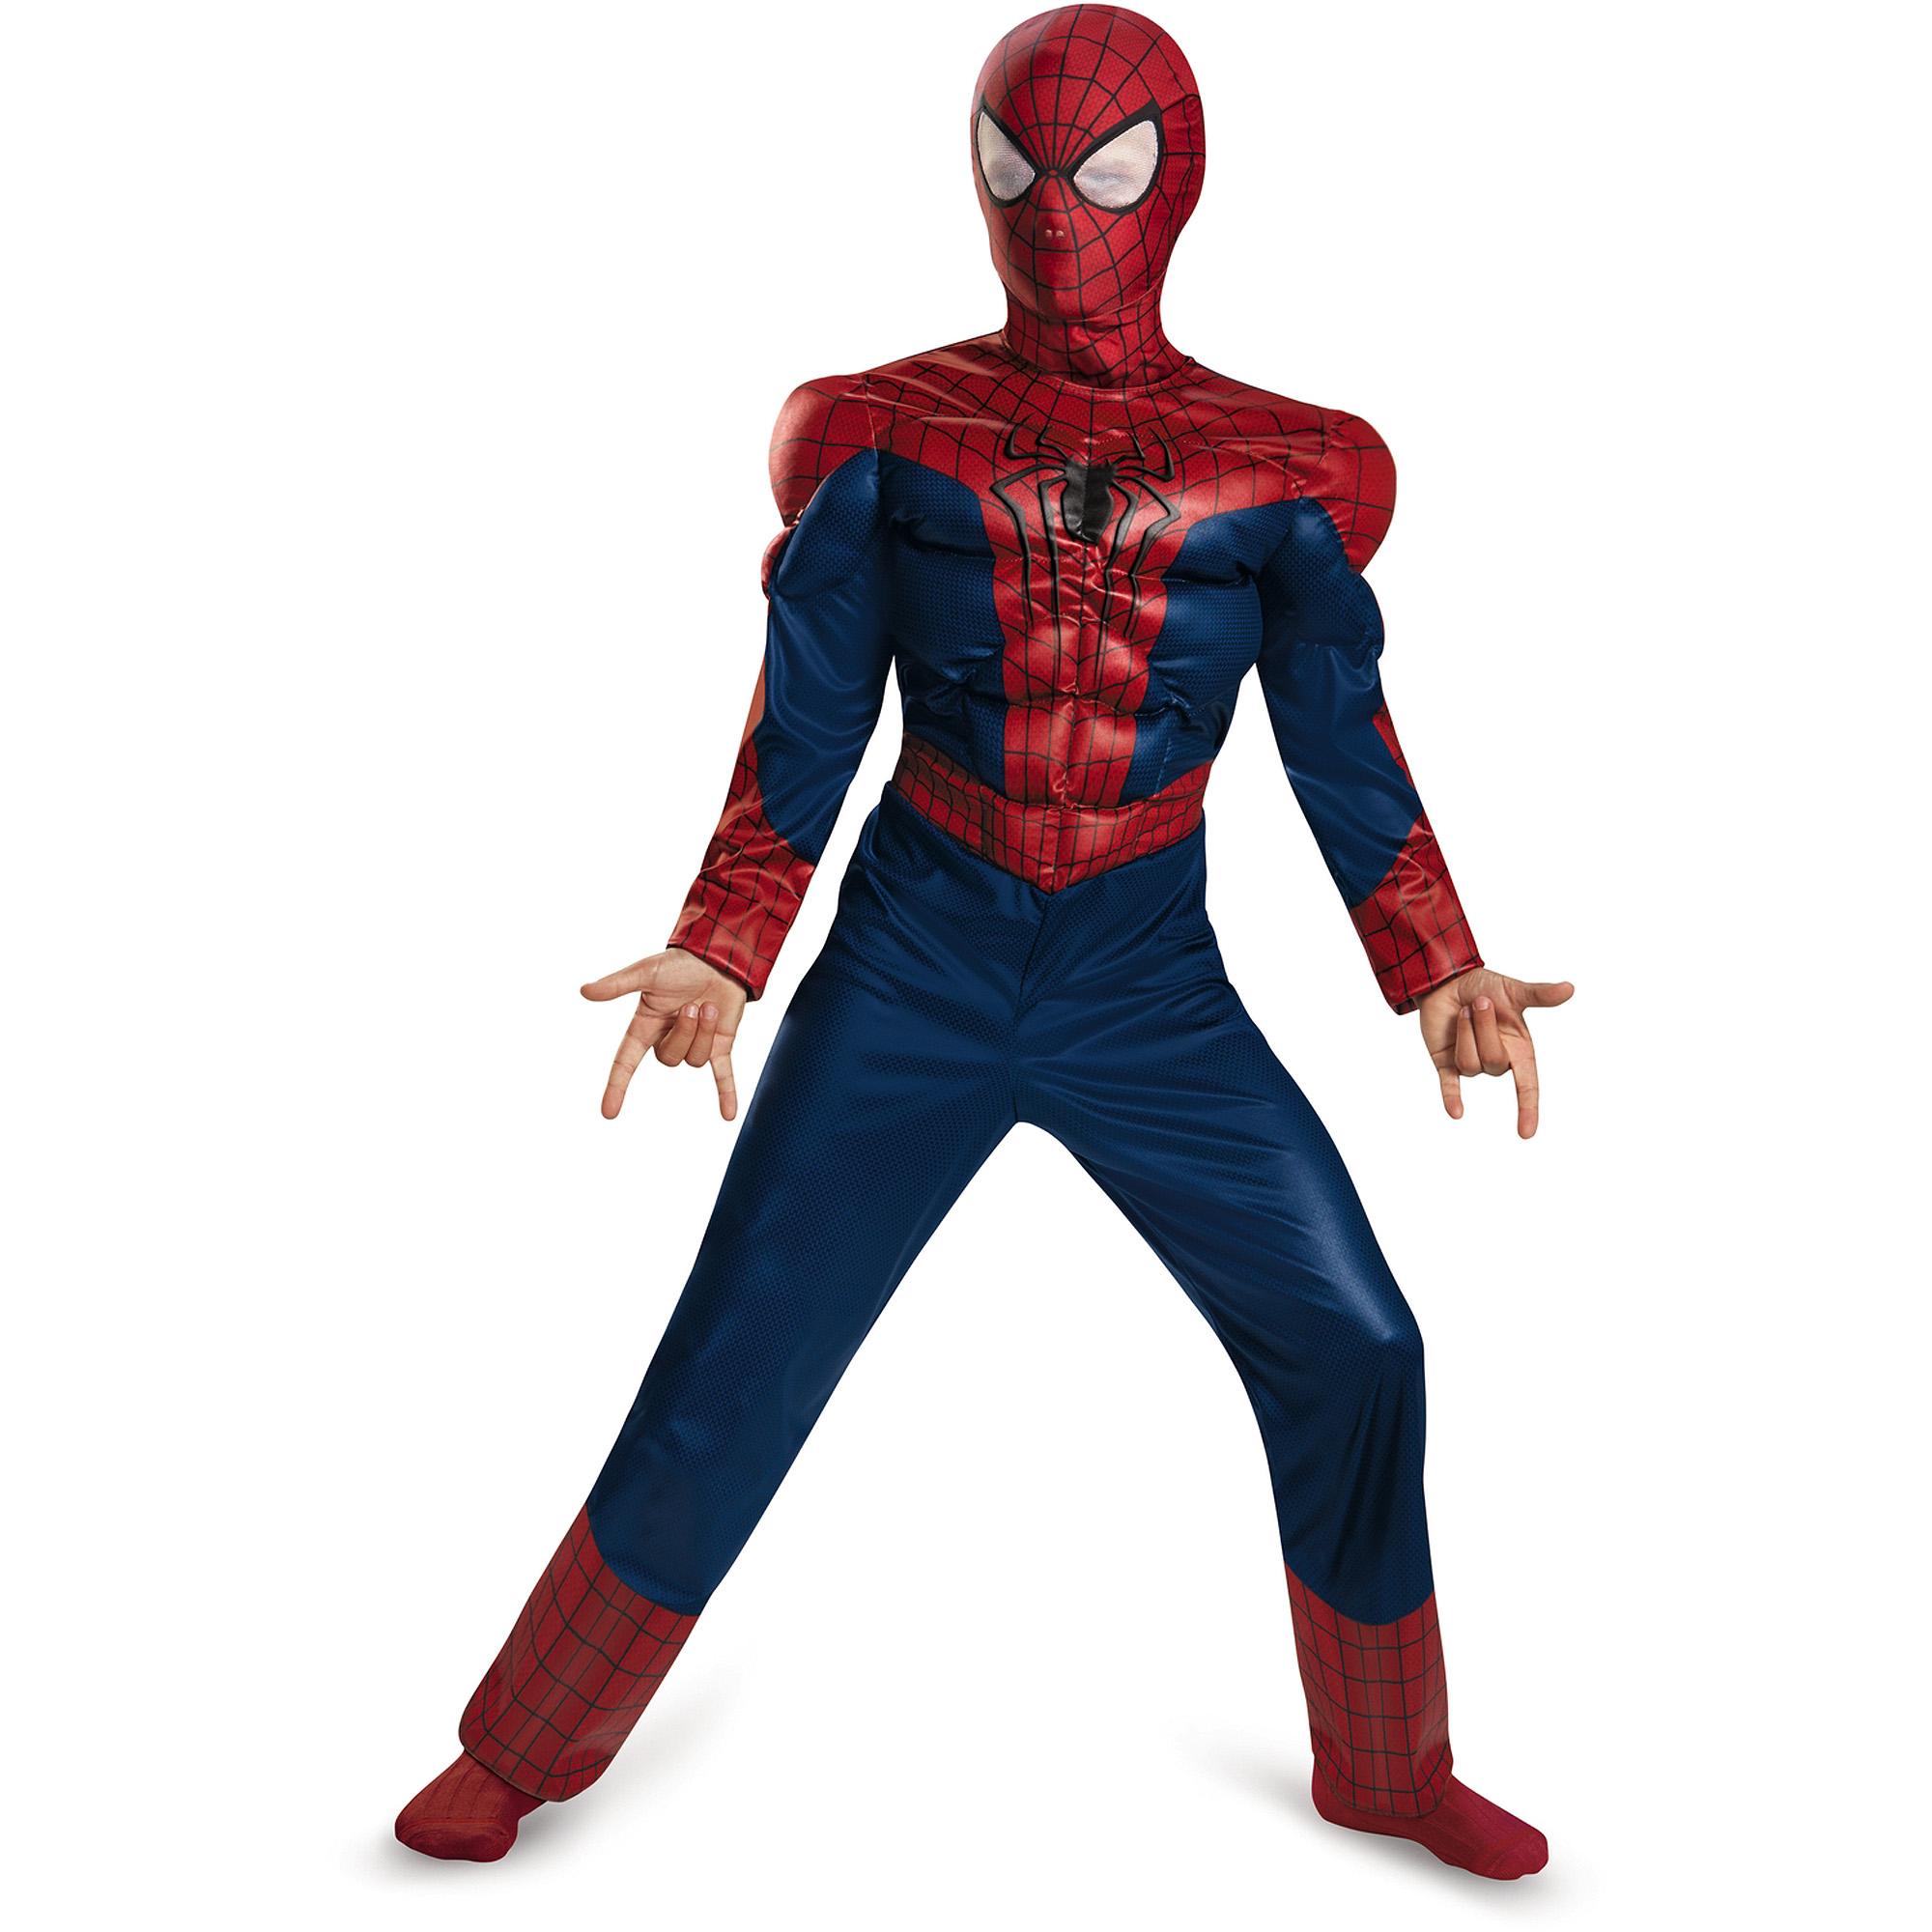 Spider-Man Muscle Child Halloween Costume